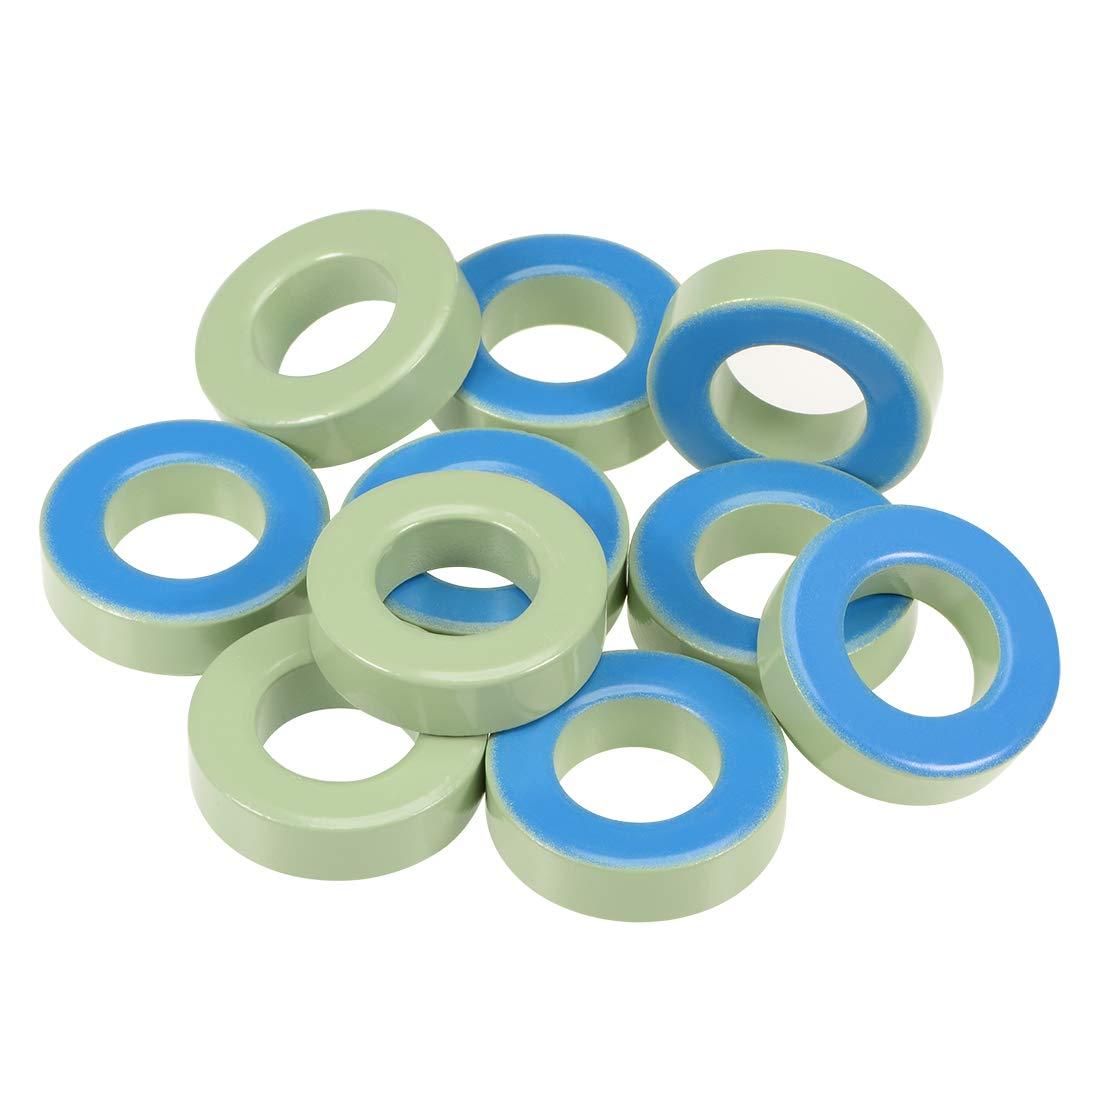 uxcell 10pcs 21.3 x 38.8 x 11.2mm Ferrite Ring Iron Powder Toroid Cores Light Green Blue